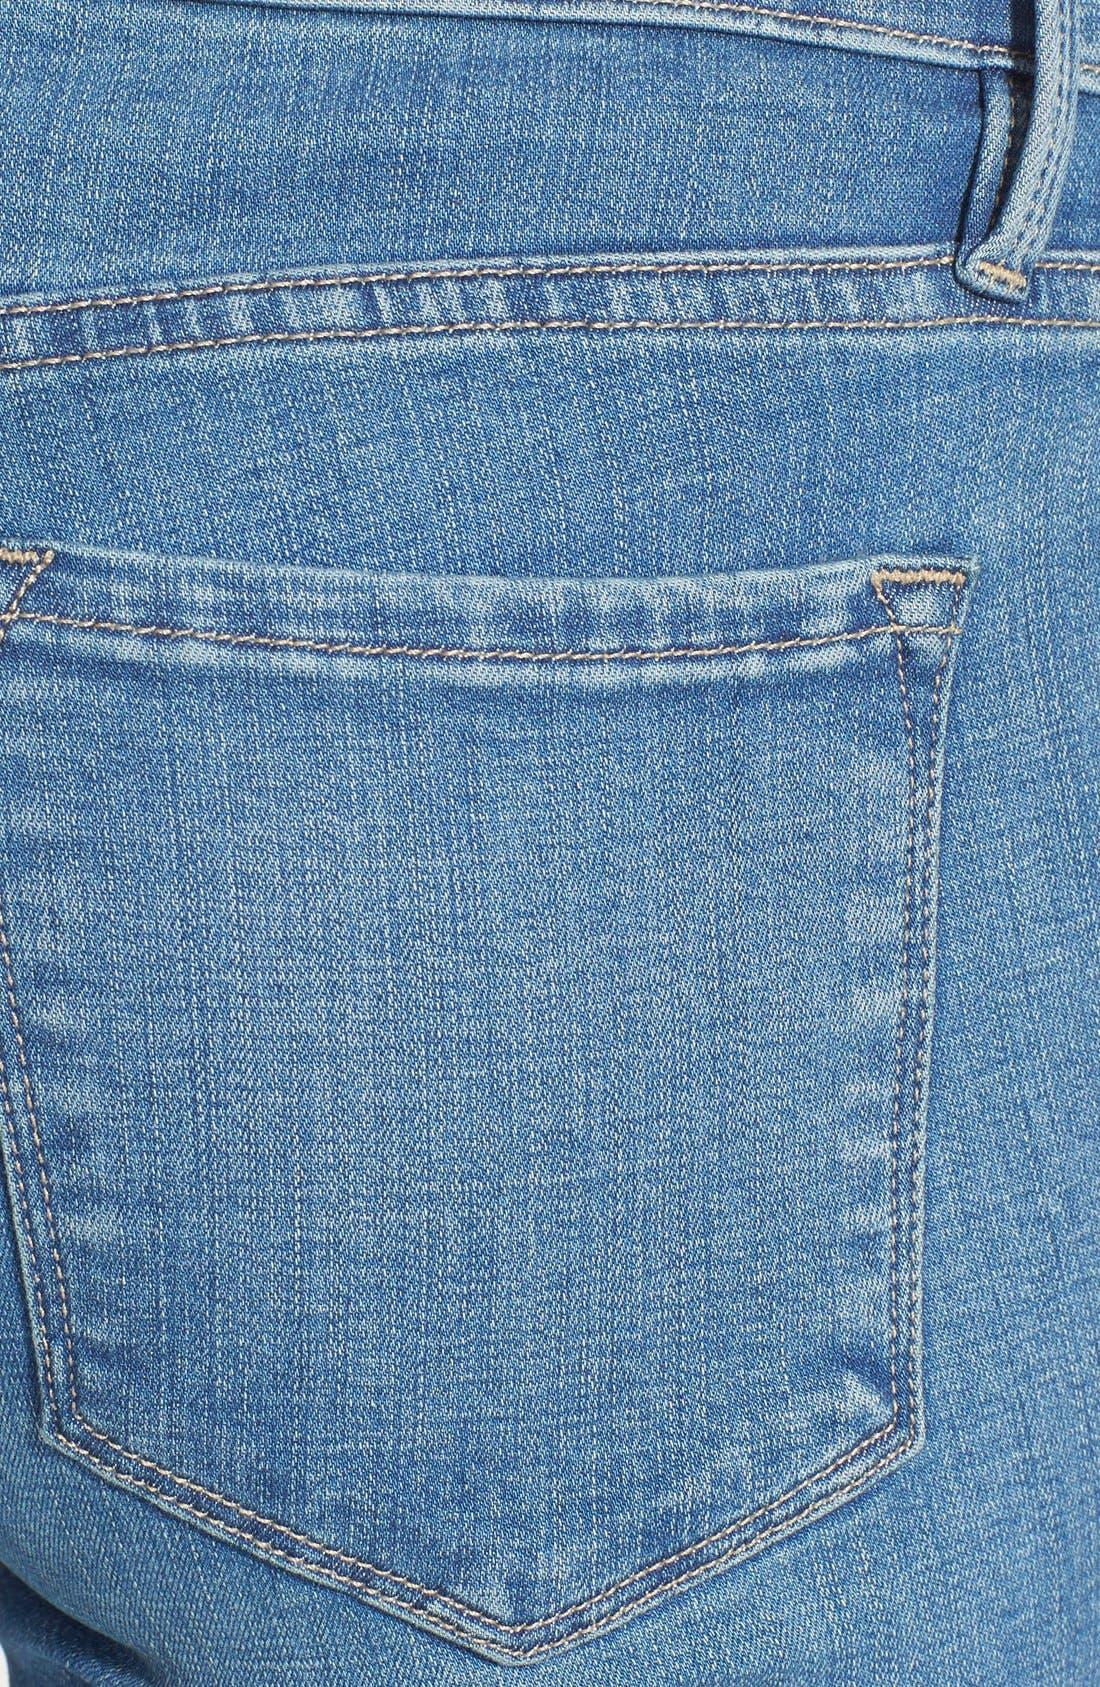 Alternate Image 3  - Frame Denim 'Le Skinny de Jeanne' Jeans (Alverstone) (Nordstrom Exclusive)